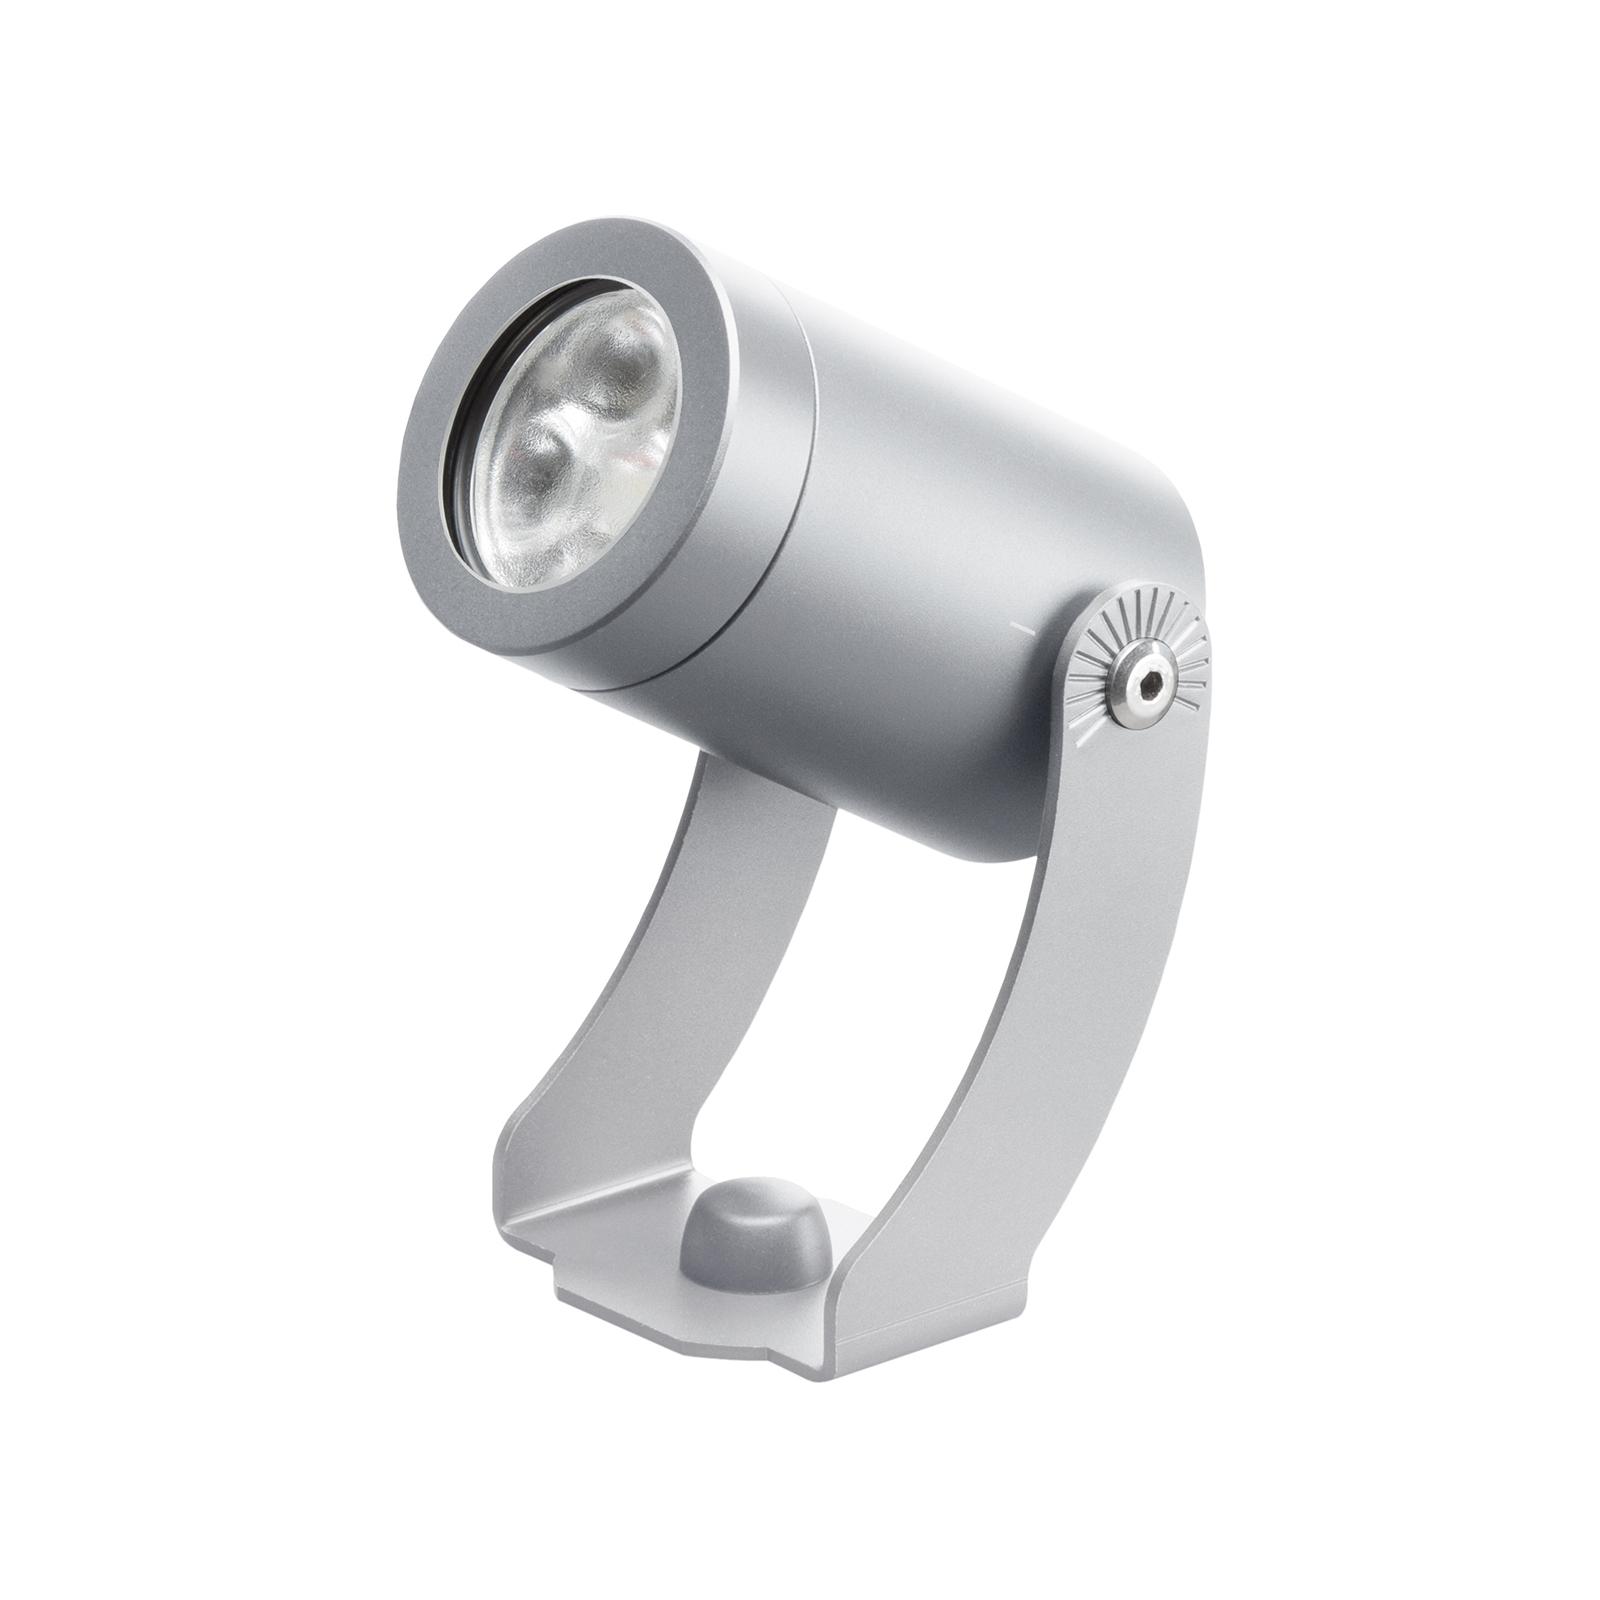 Reflektor zewnętrzny LED 1441LED, srebrny, 30°